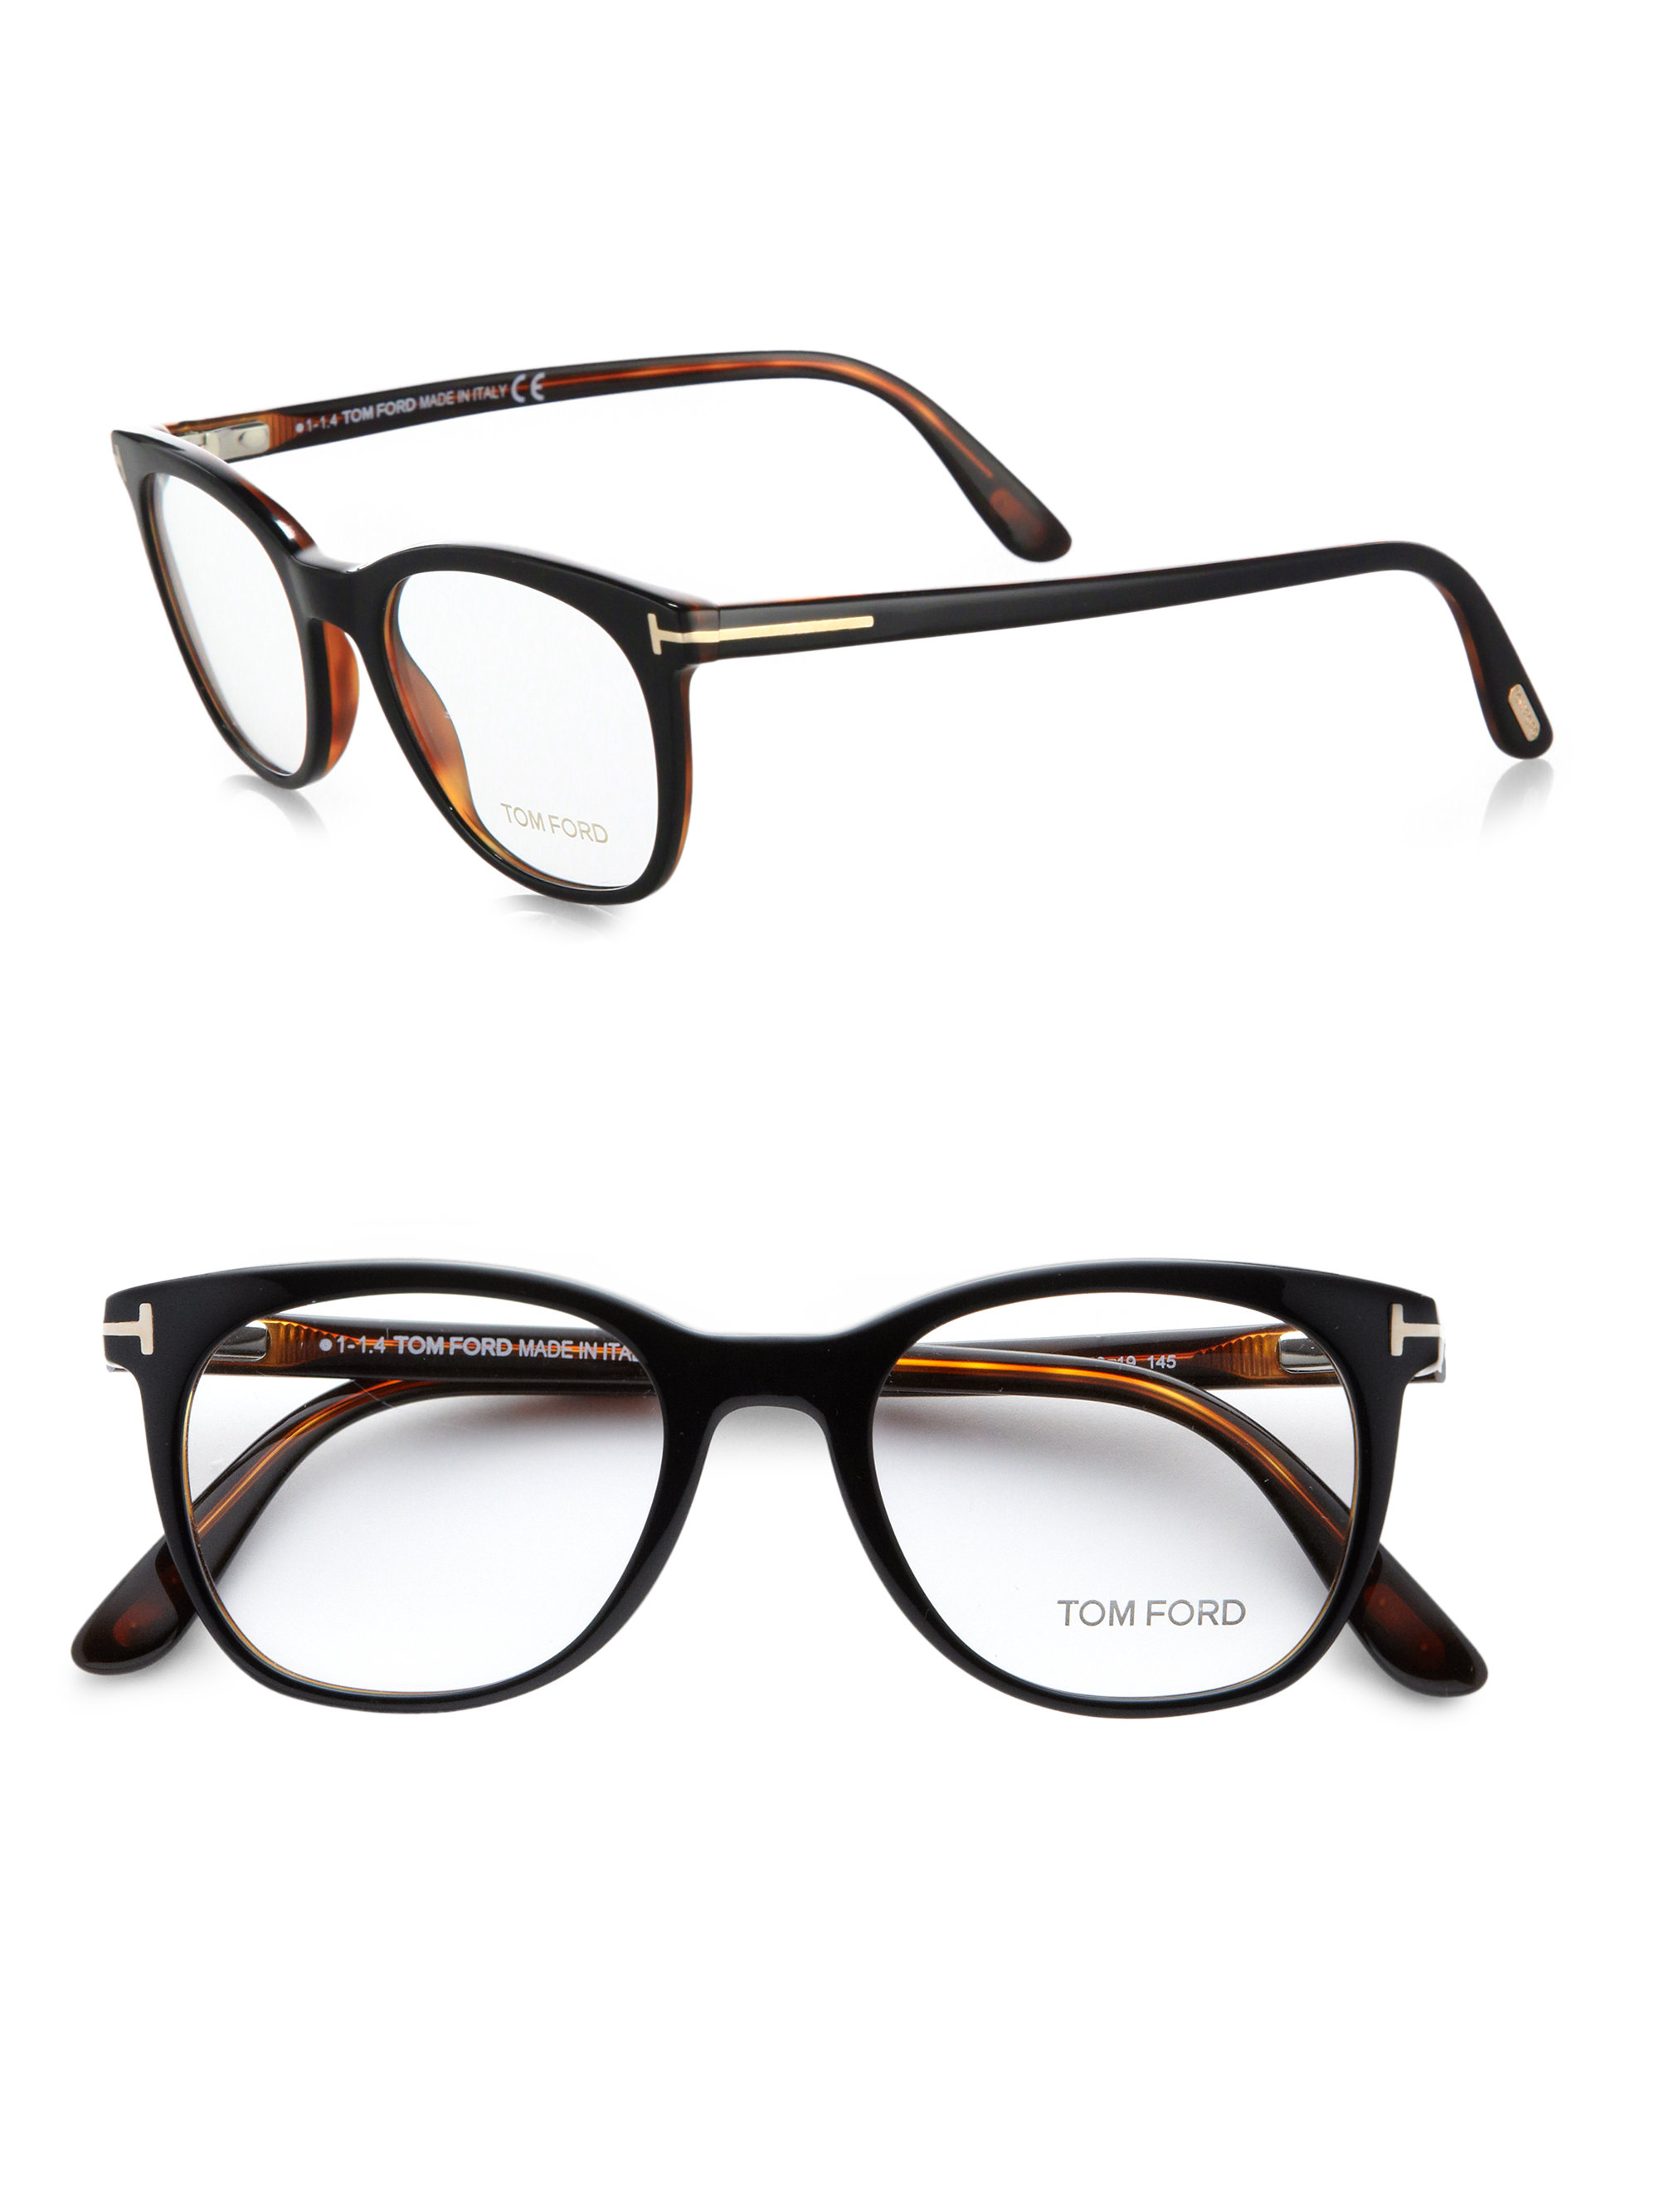 7e17e7ff23 ... Lyst  Tom Ford Round-Frame Tortoiseshell Acetate Optical Glasses